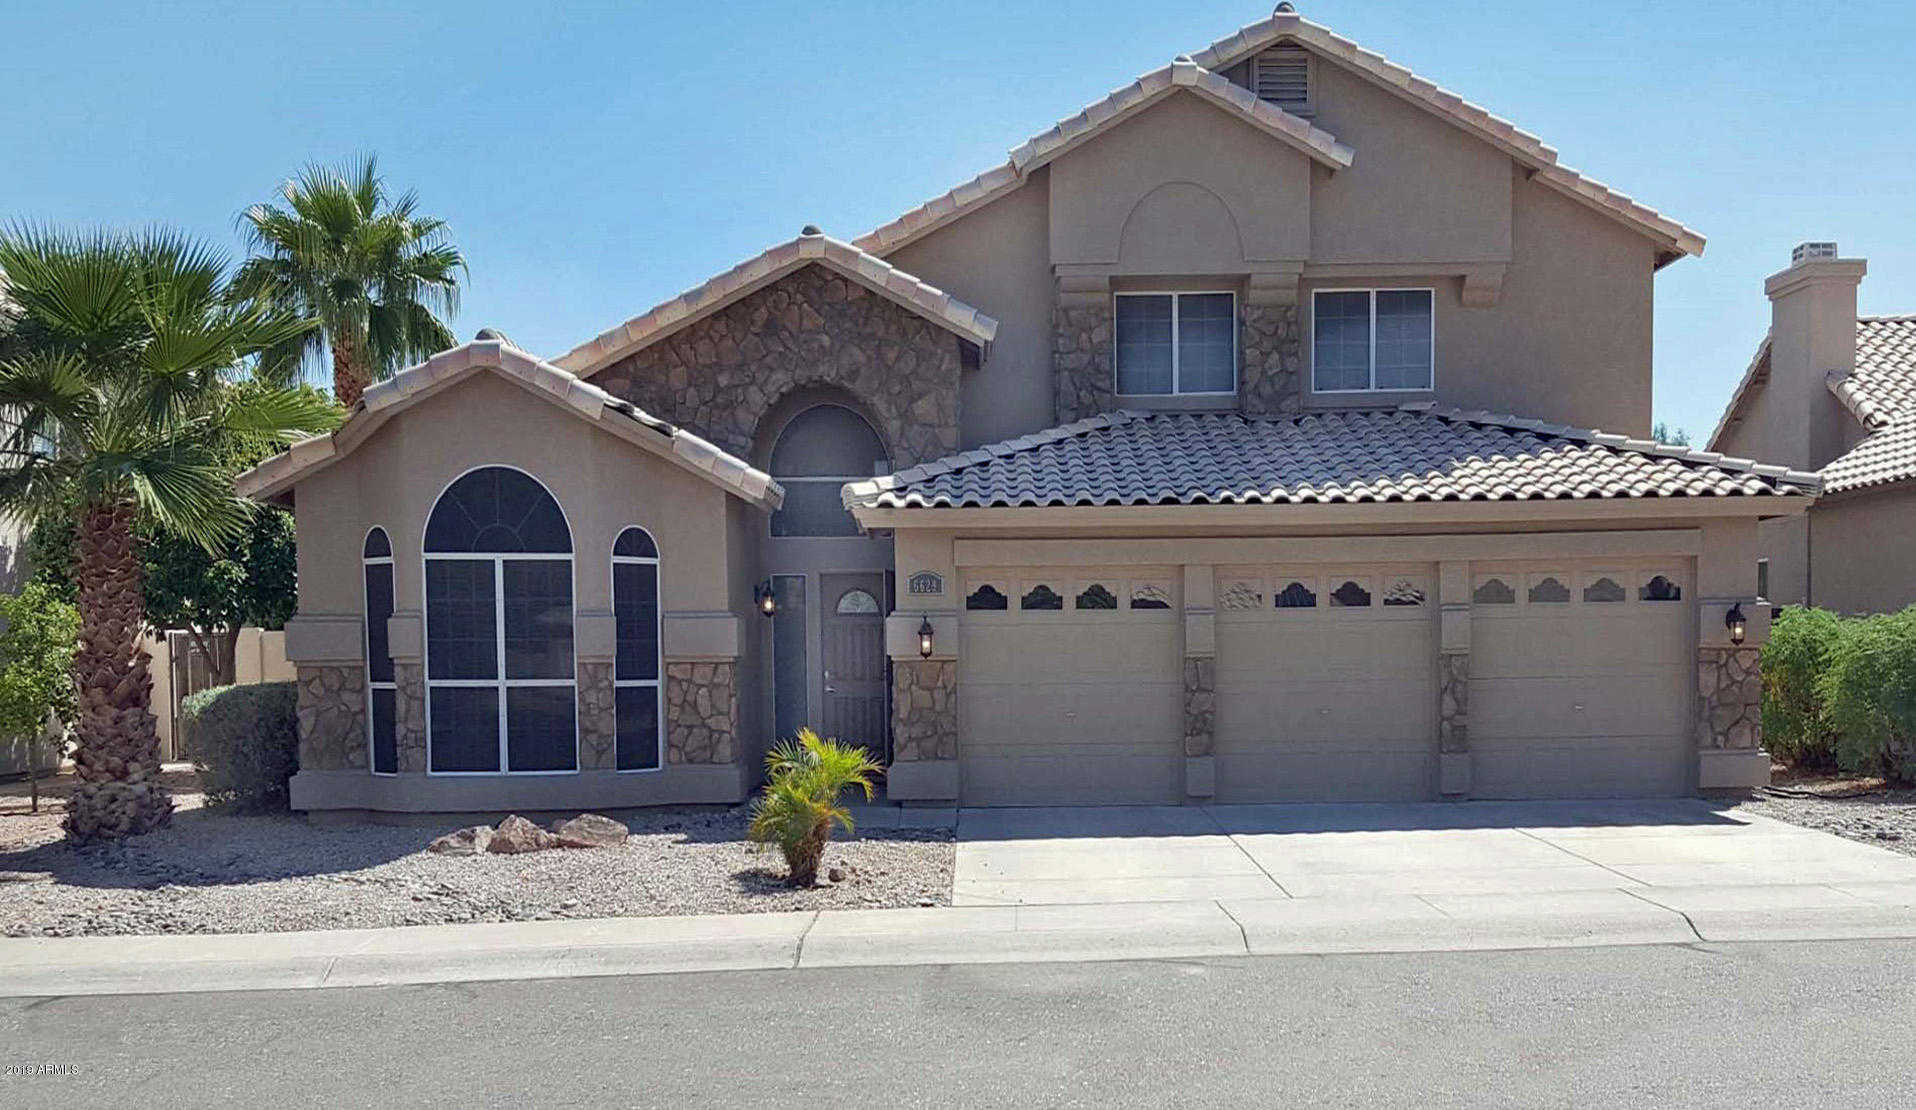 $415,000 - 4Br/3Ba - Home for Sale in Hamilton Arrowhead Ranch 5, Glendale